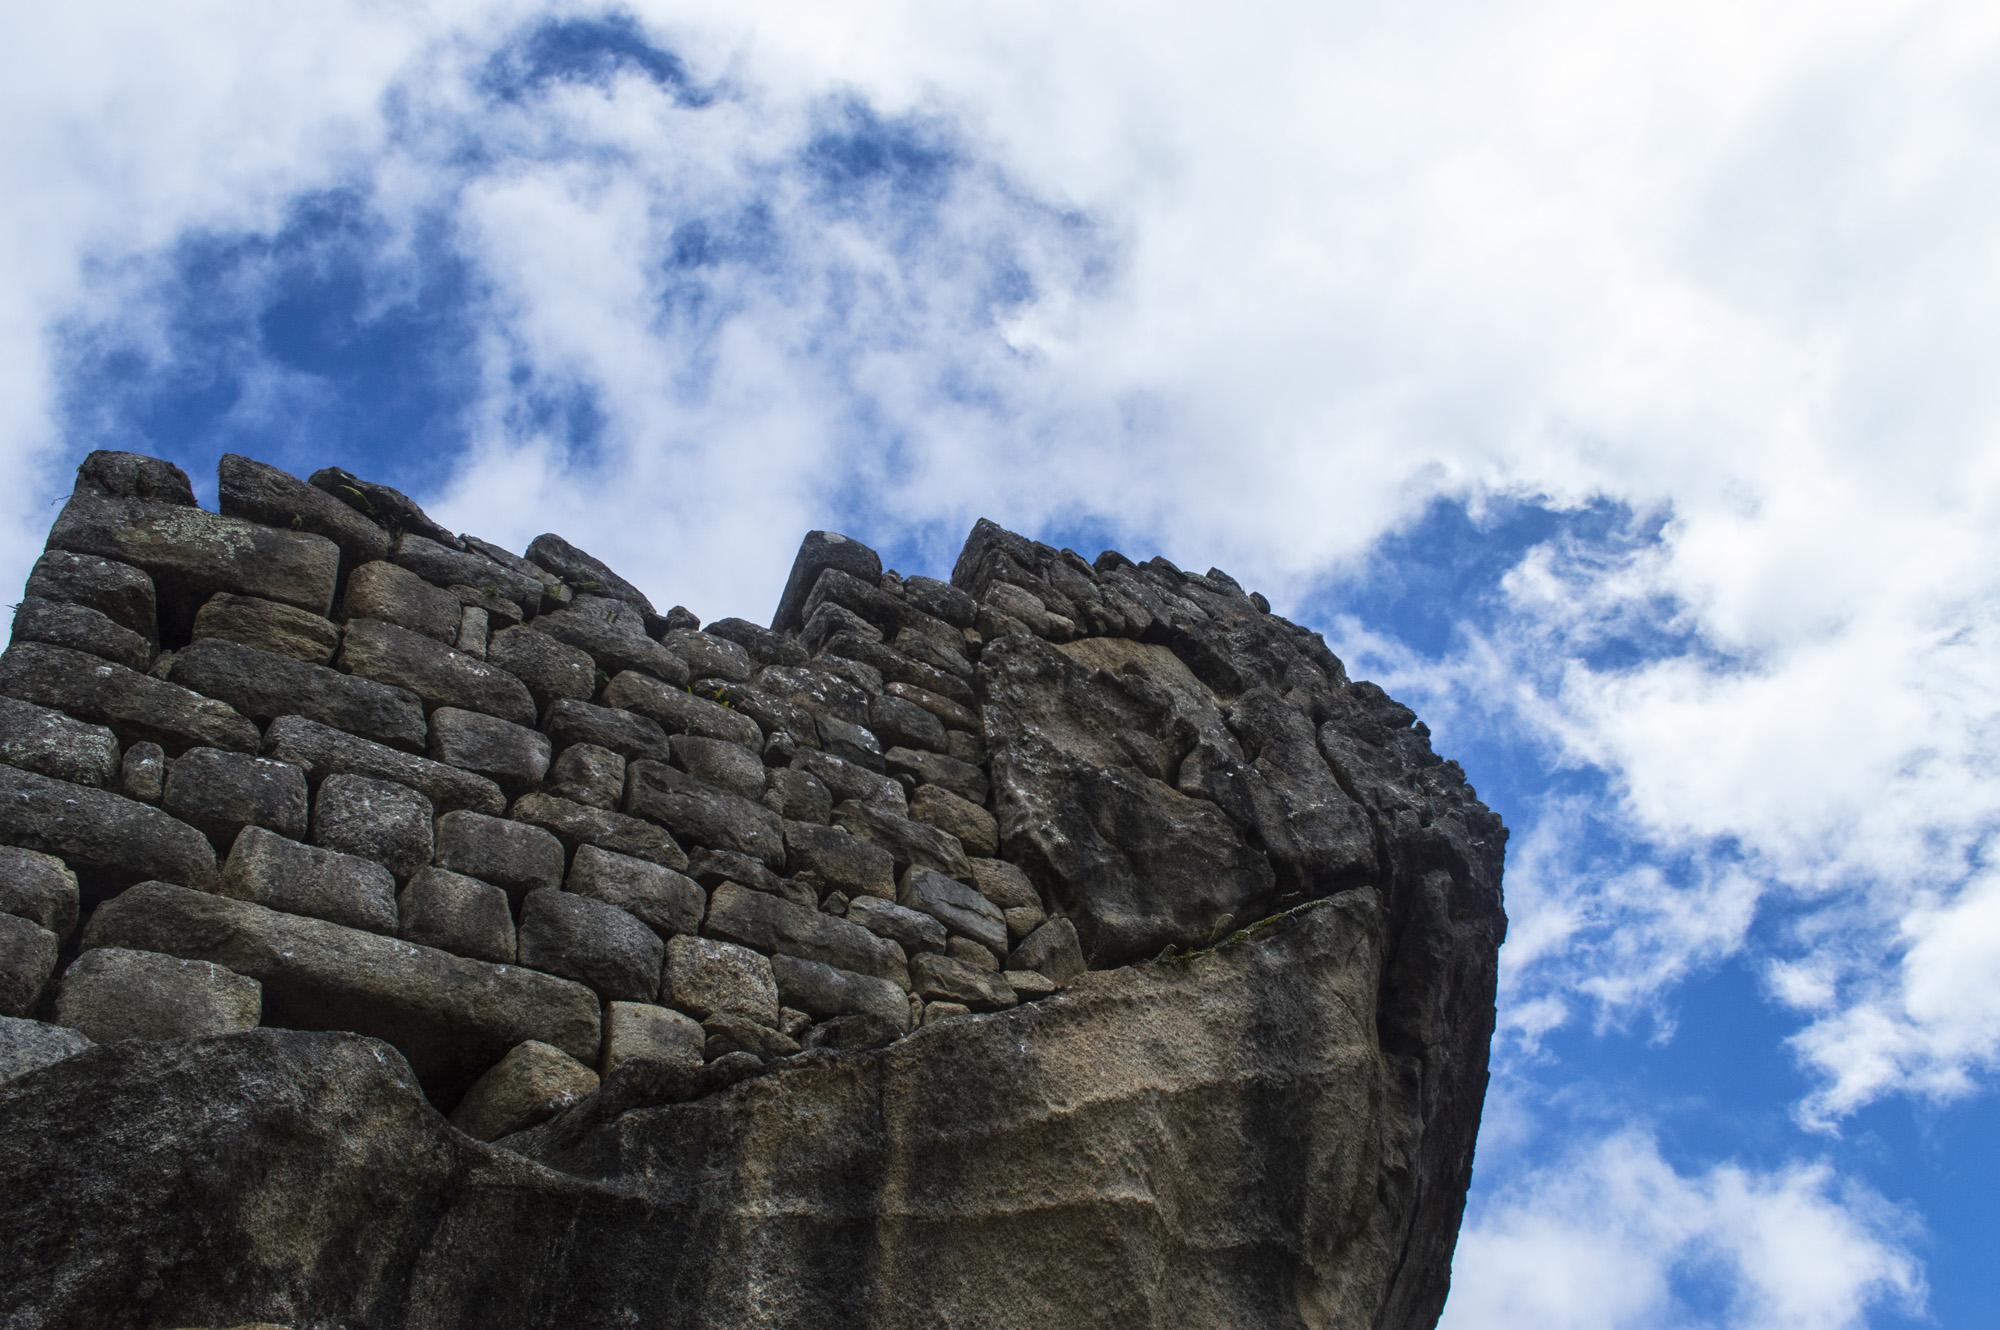 Inca 5 MP ruin and sky.jpg